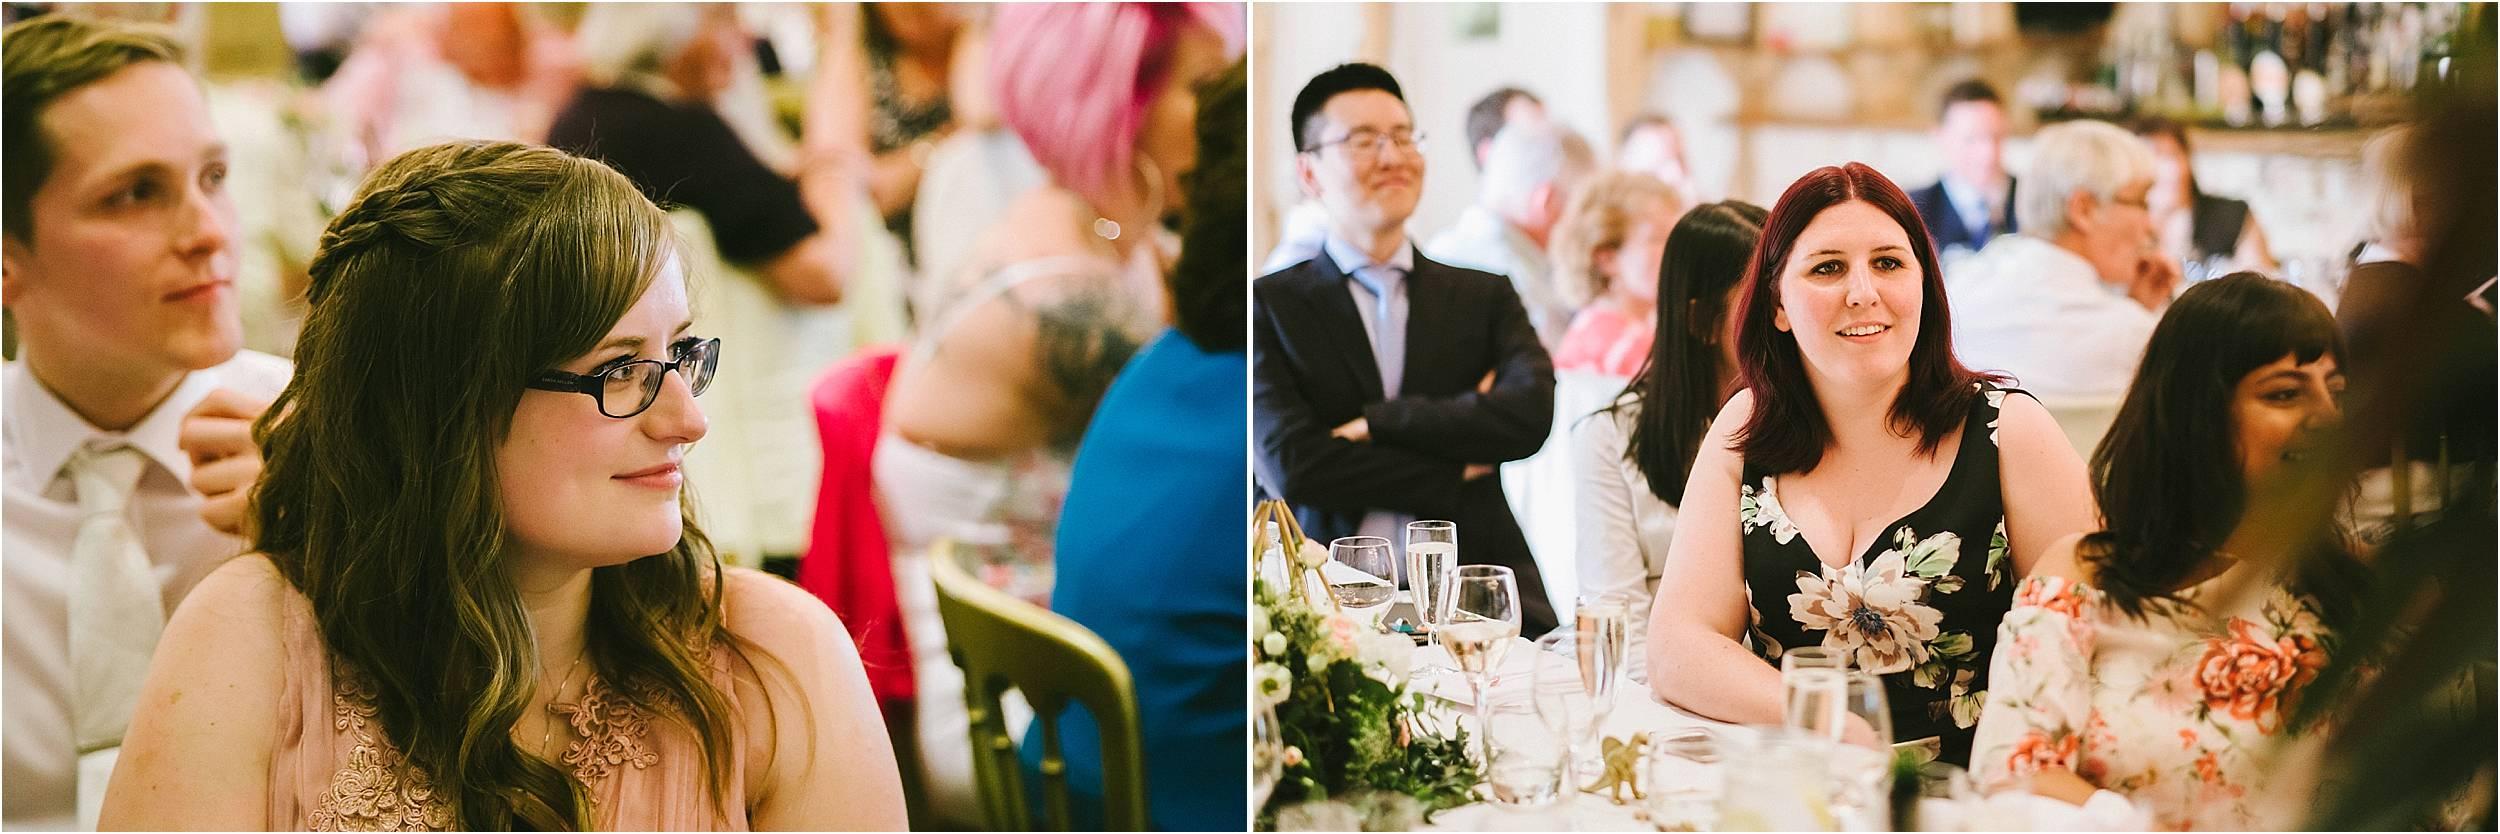 Cambridge Wedding Photographer_0159.jpg